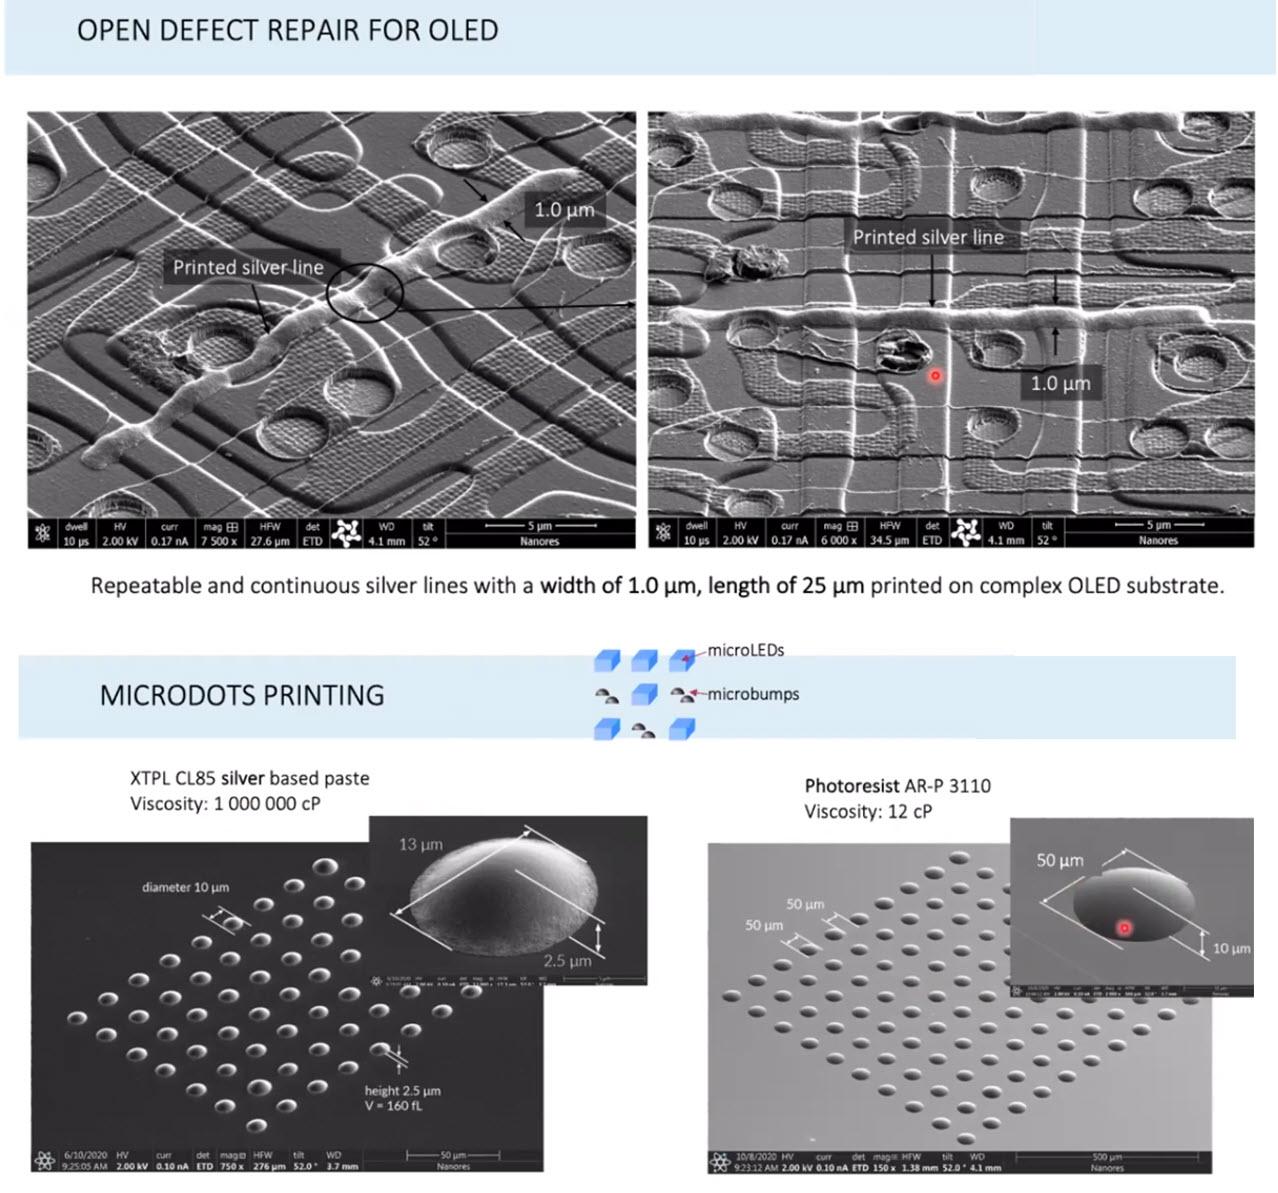 显示器印刷的多样化世界:印刷如何影响MicroLED,AMOLED,AMQLED,AR/VR  第8张